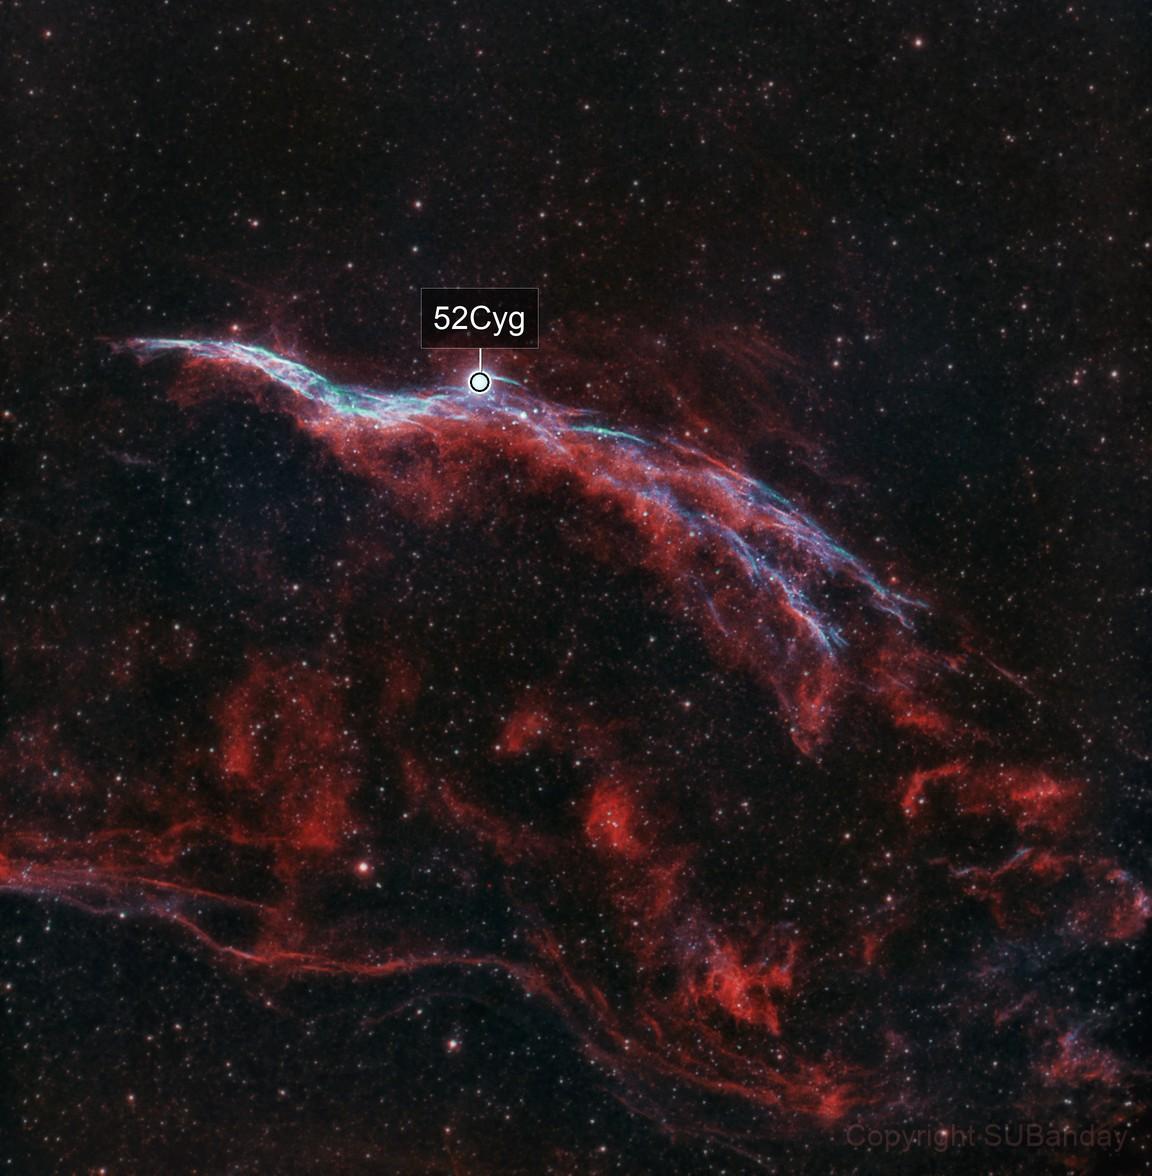 Western Veil Nebula in Bicolor over Bortle 8 skies - Lahore